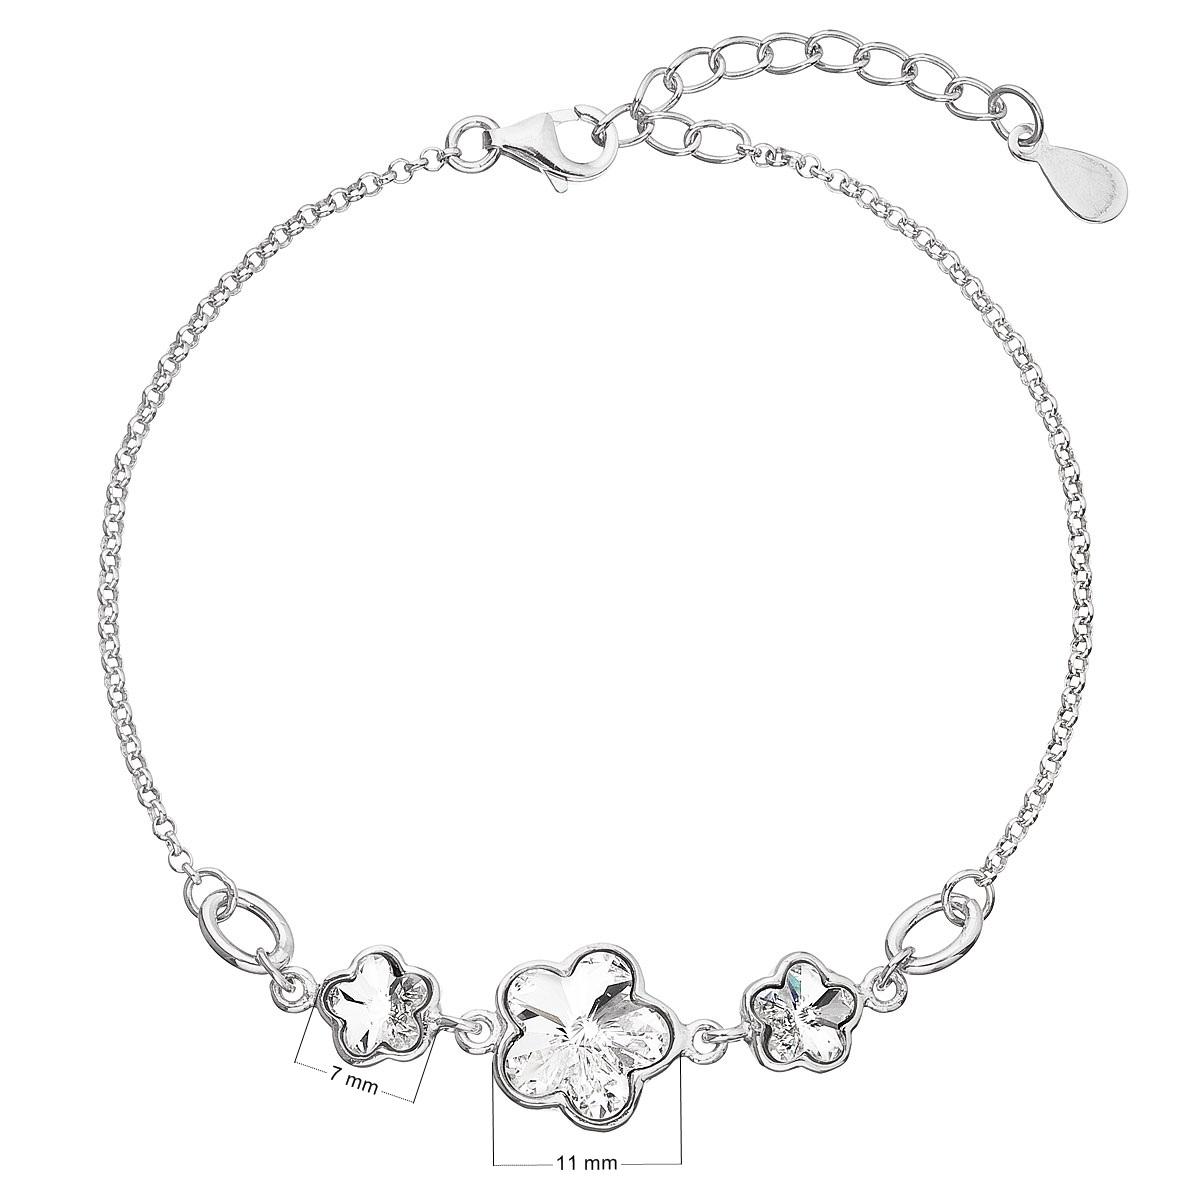 Stříbrný náramek s kytičkami Crystals from Swarovski® Crystal EG7050-CR